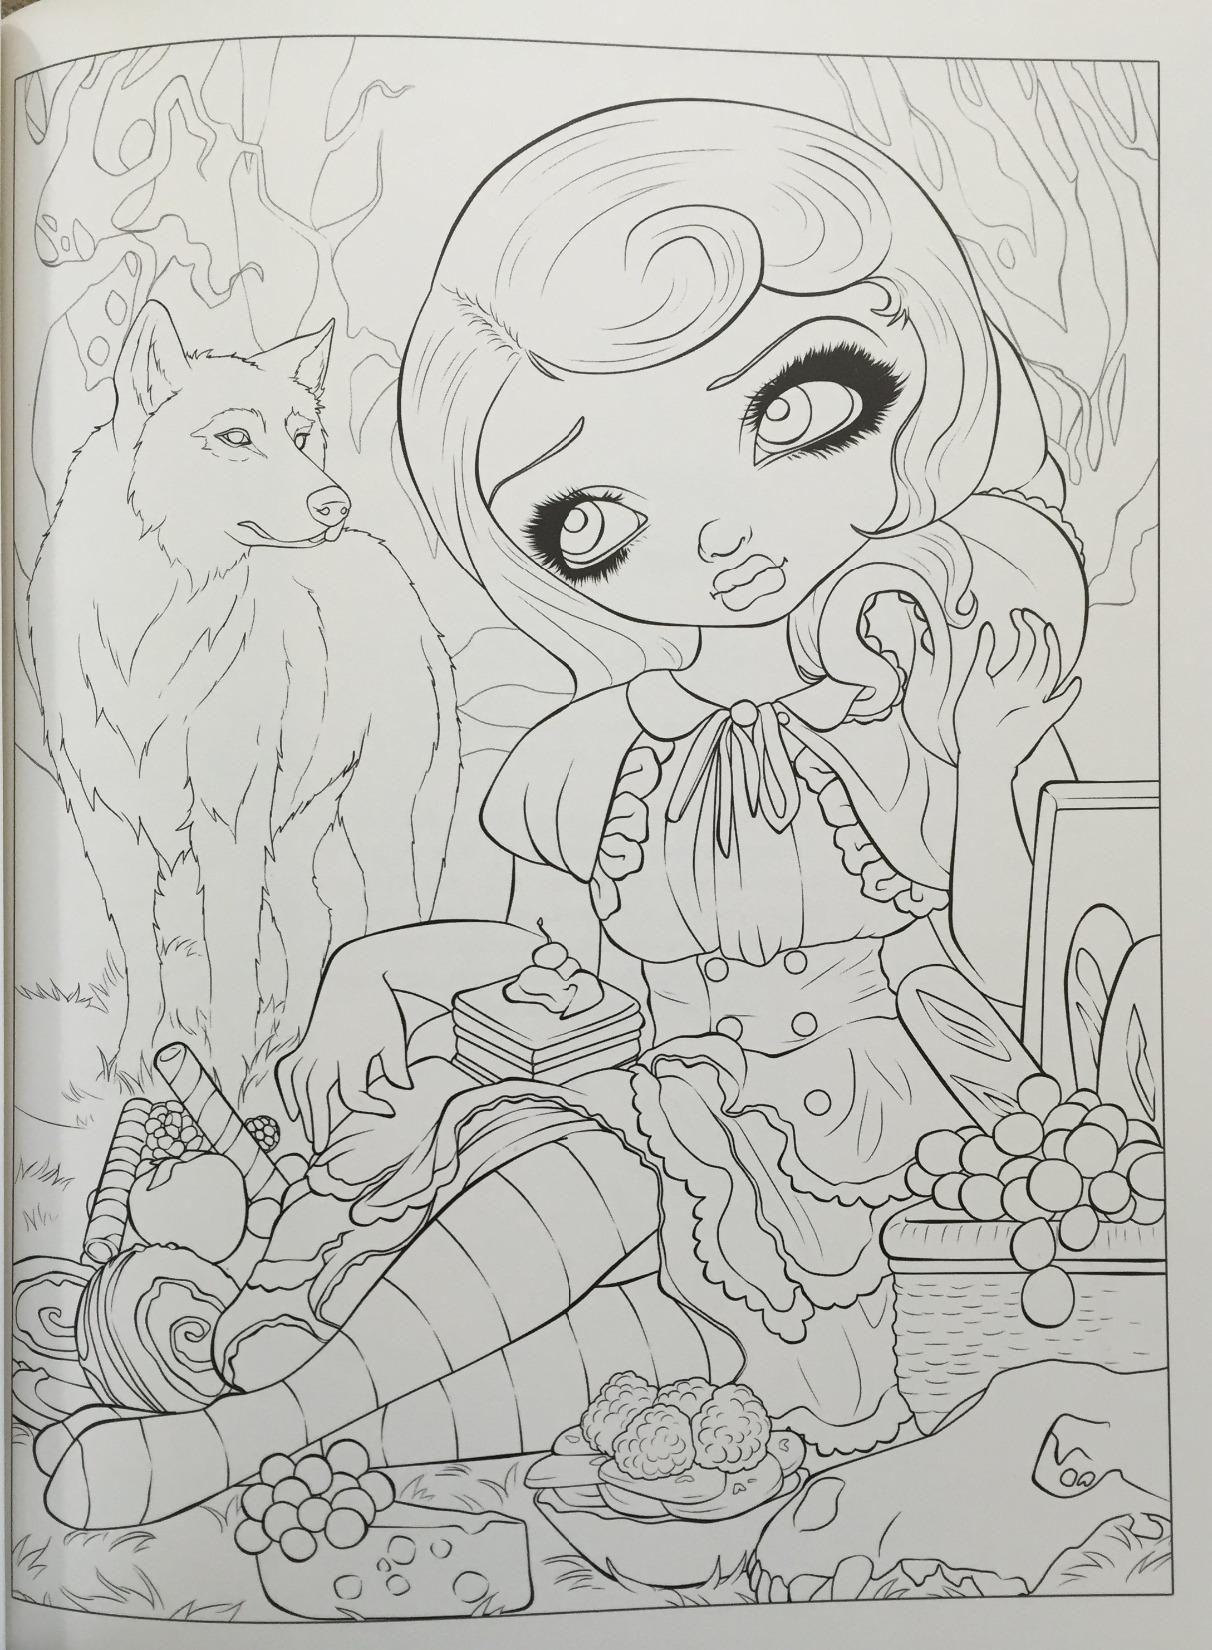 Amazon Com Jasmine Becket Griffith Coloring Book A Fantasy Art Adventure 9780738750019 Jasmine Becket G Coloring Books Coloring Pages Fairy Coloring Pages